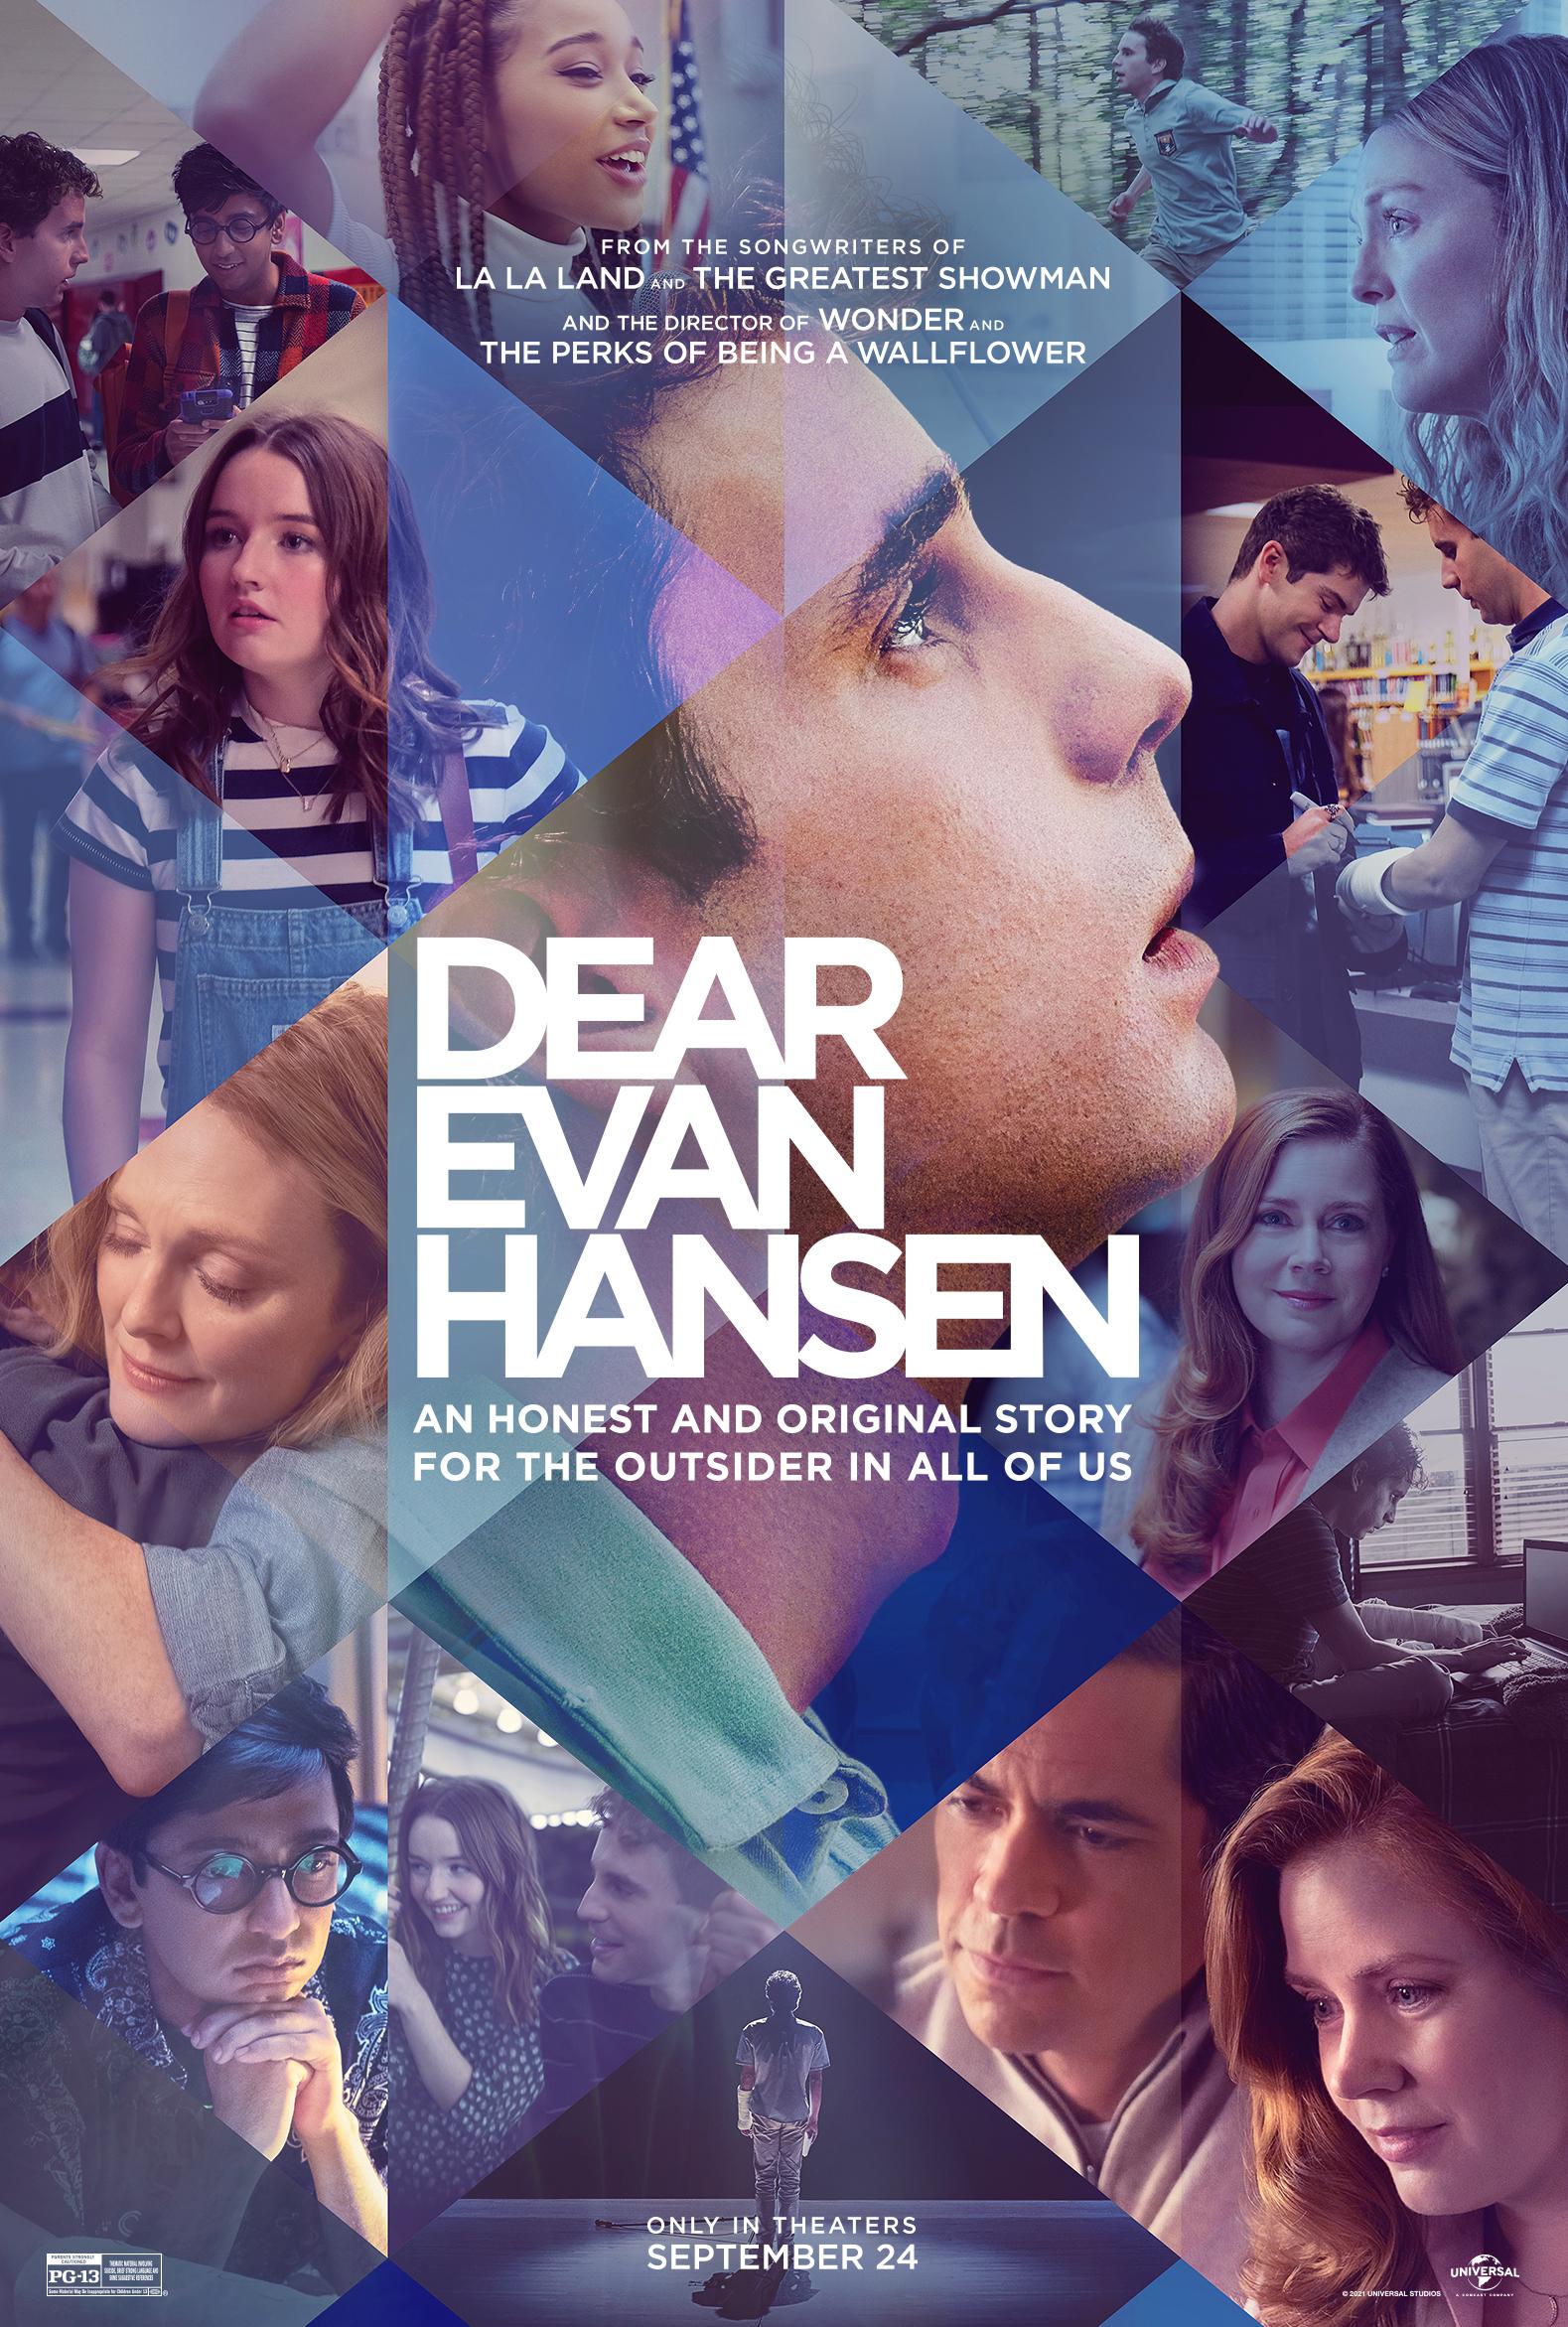 Movie poster image for DEAR EVAN HANSEN